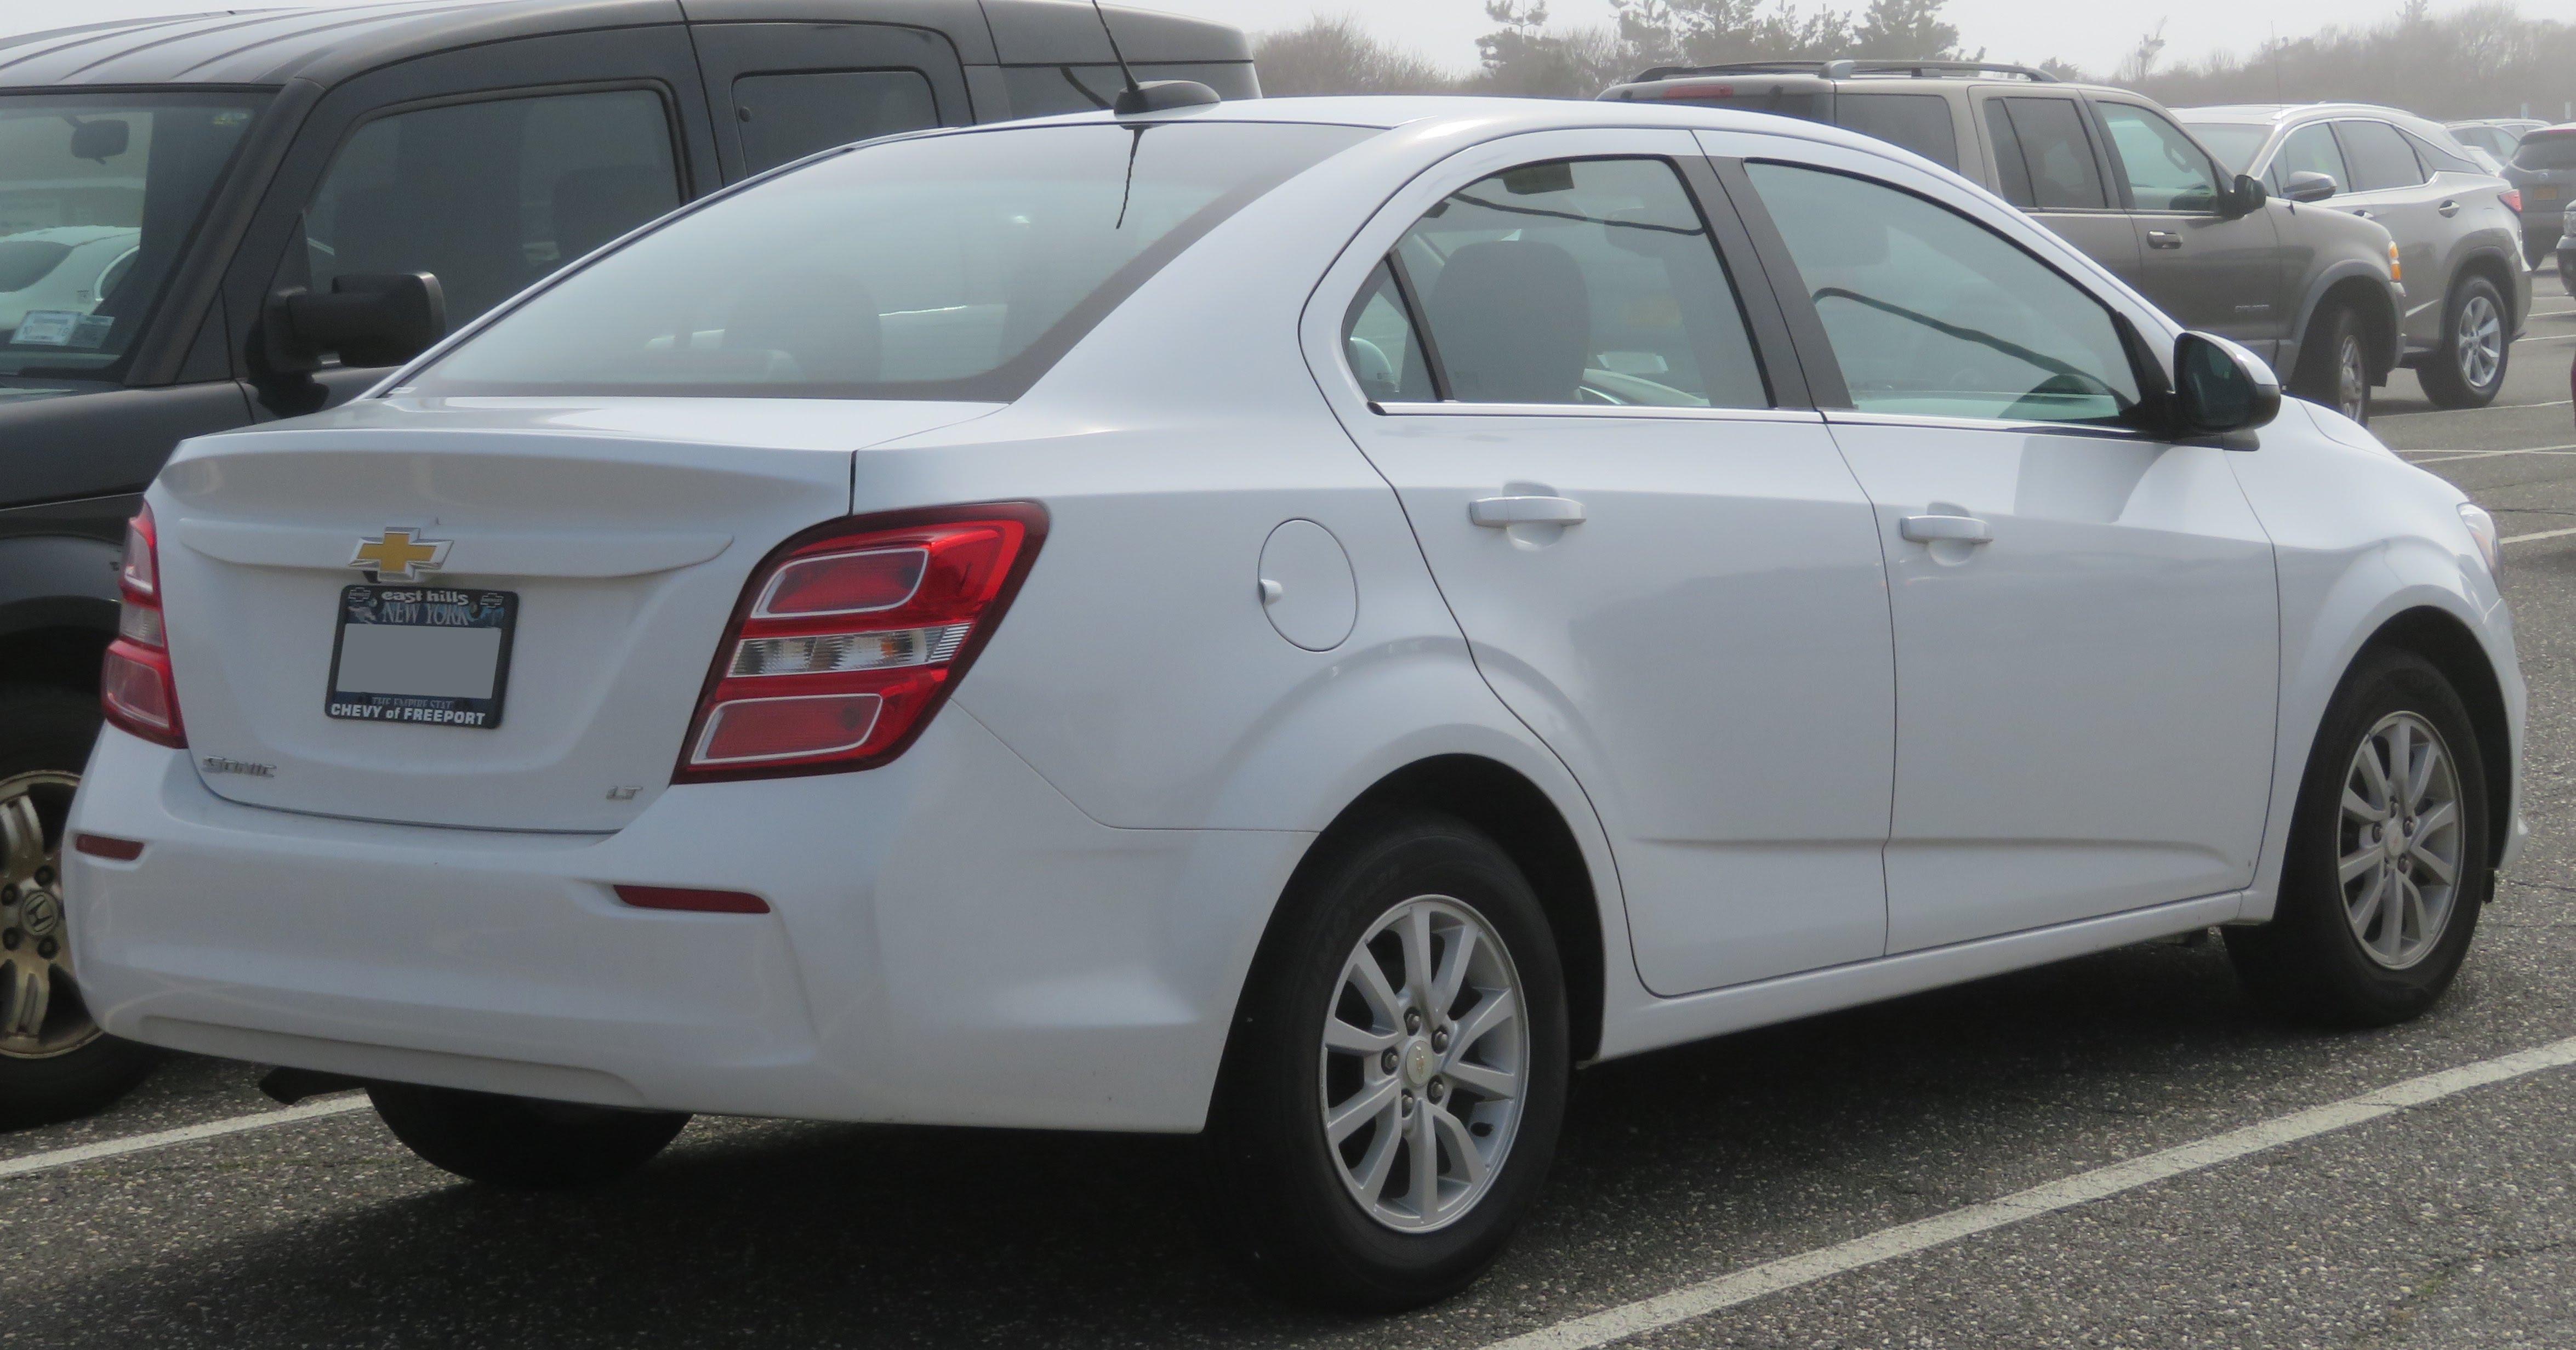 file 2017 chevrolet sonic lt sedan rear 4 28 18 jpg wikimedia commons rh commons wikimedia org